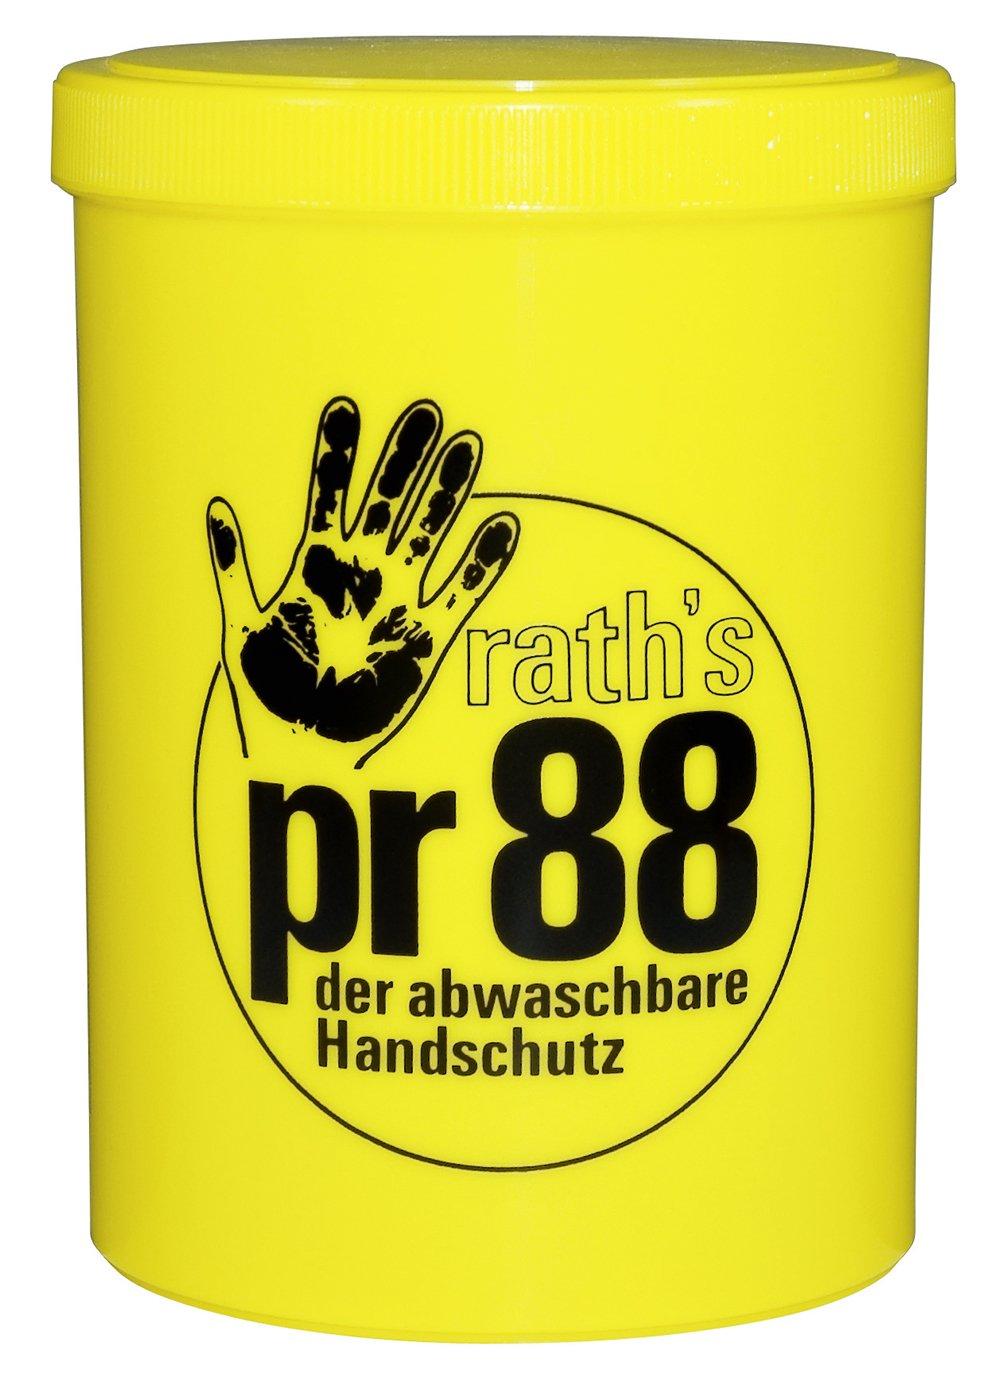 Rath's Hautschutzcreme, 1er Pack Rath' s Hautschutzcreme Rahts' s 8000